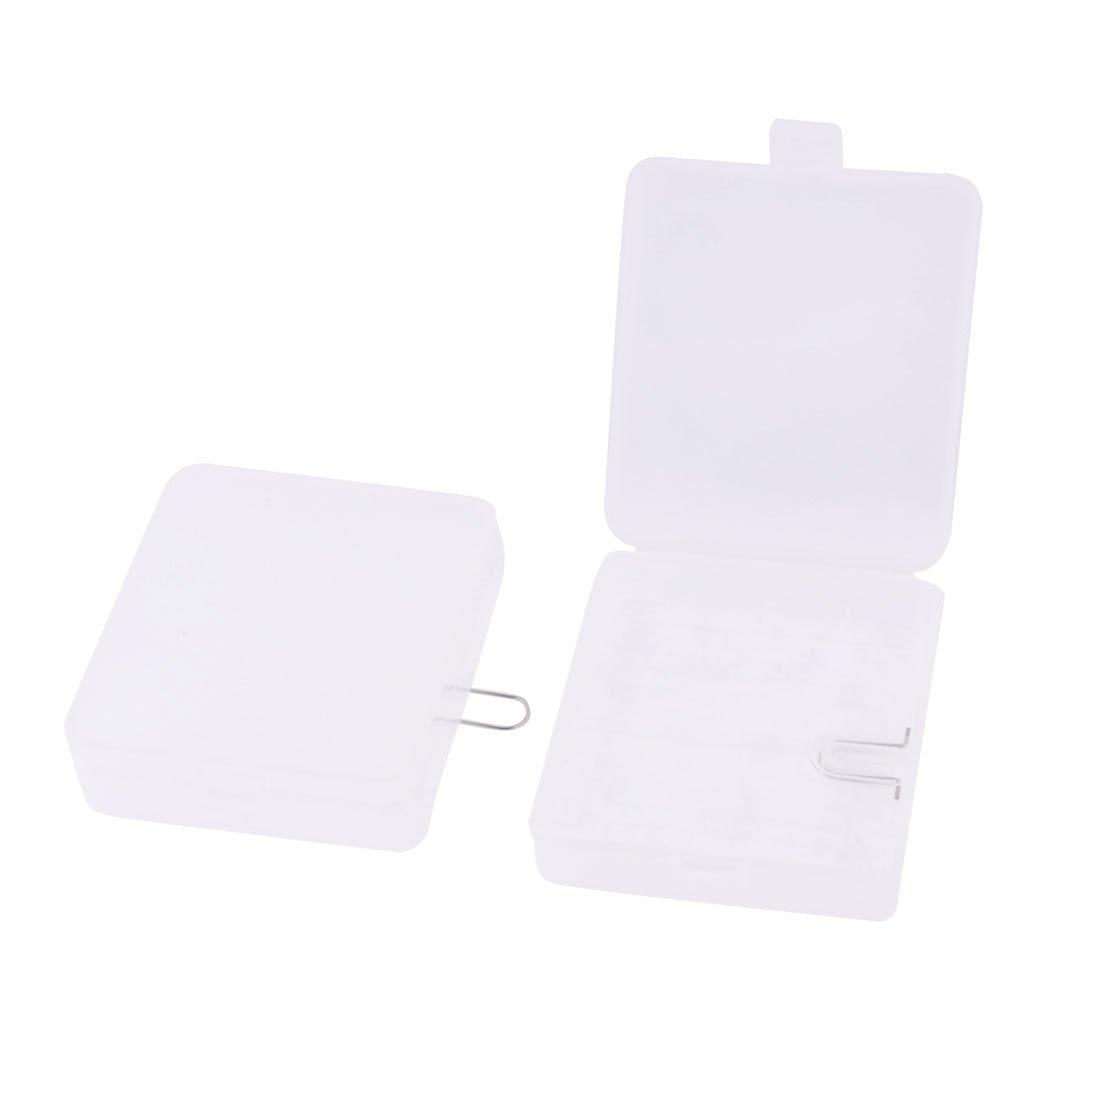 2 Pcs Clear White Plastic Storage Box Case for 4 x <font><b>18650</b></font> <font><b>Batteries</b></font>